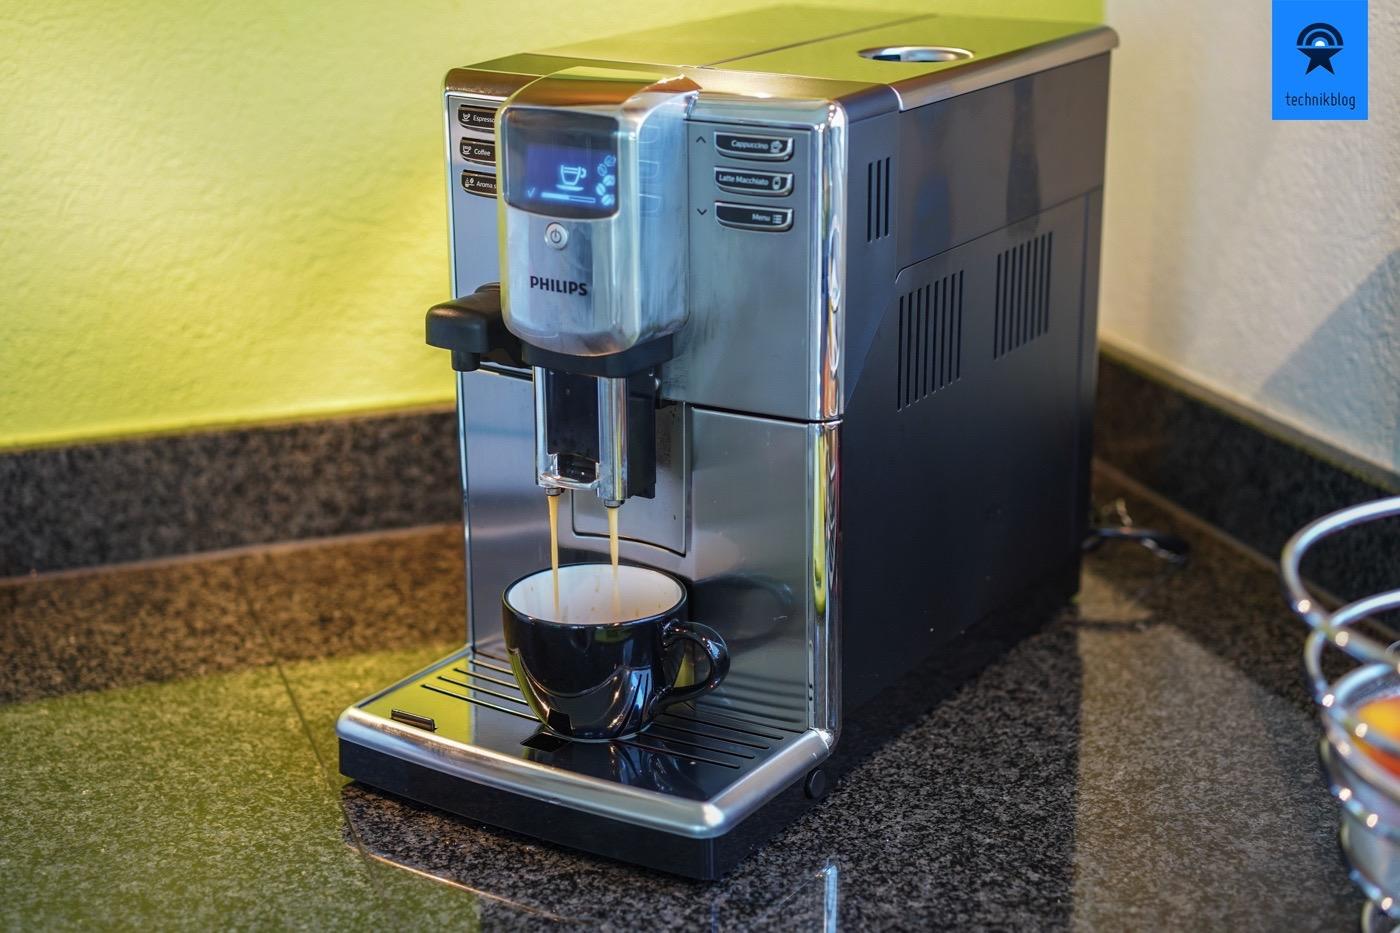 Der erste Kaffee aus dem Philips Kaffeevollautomat